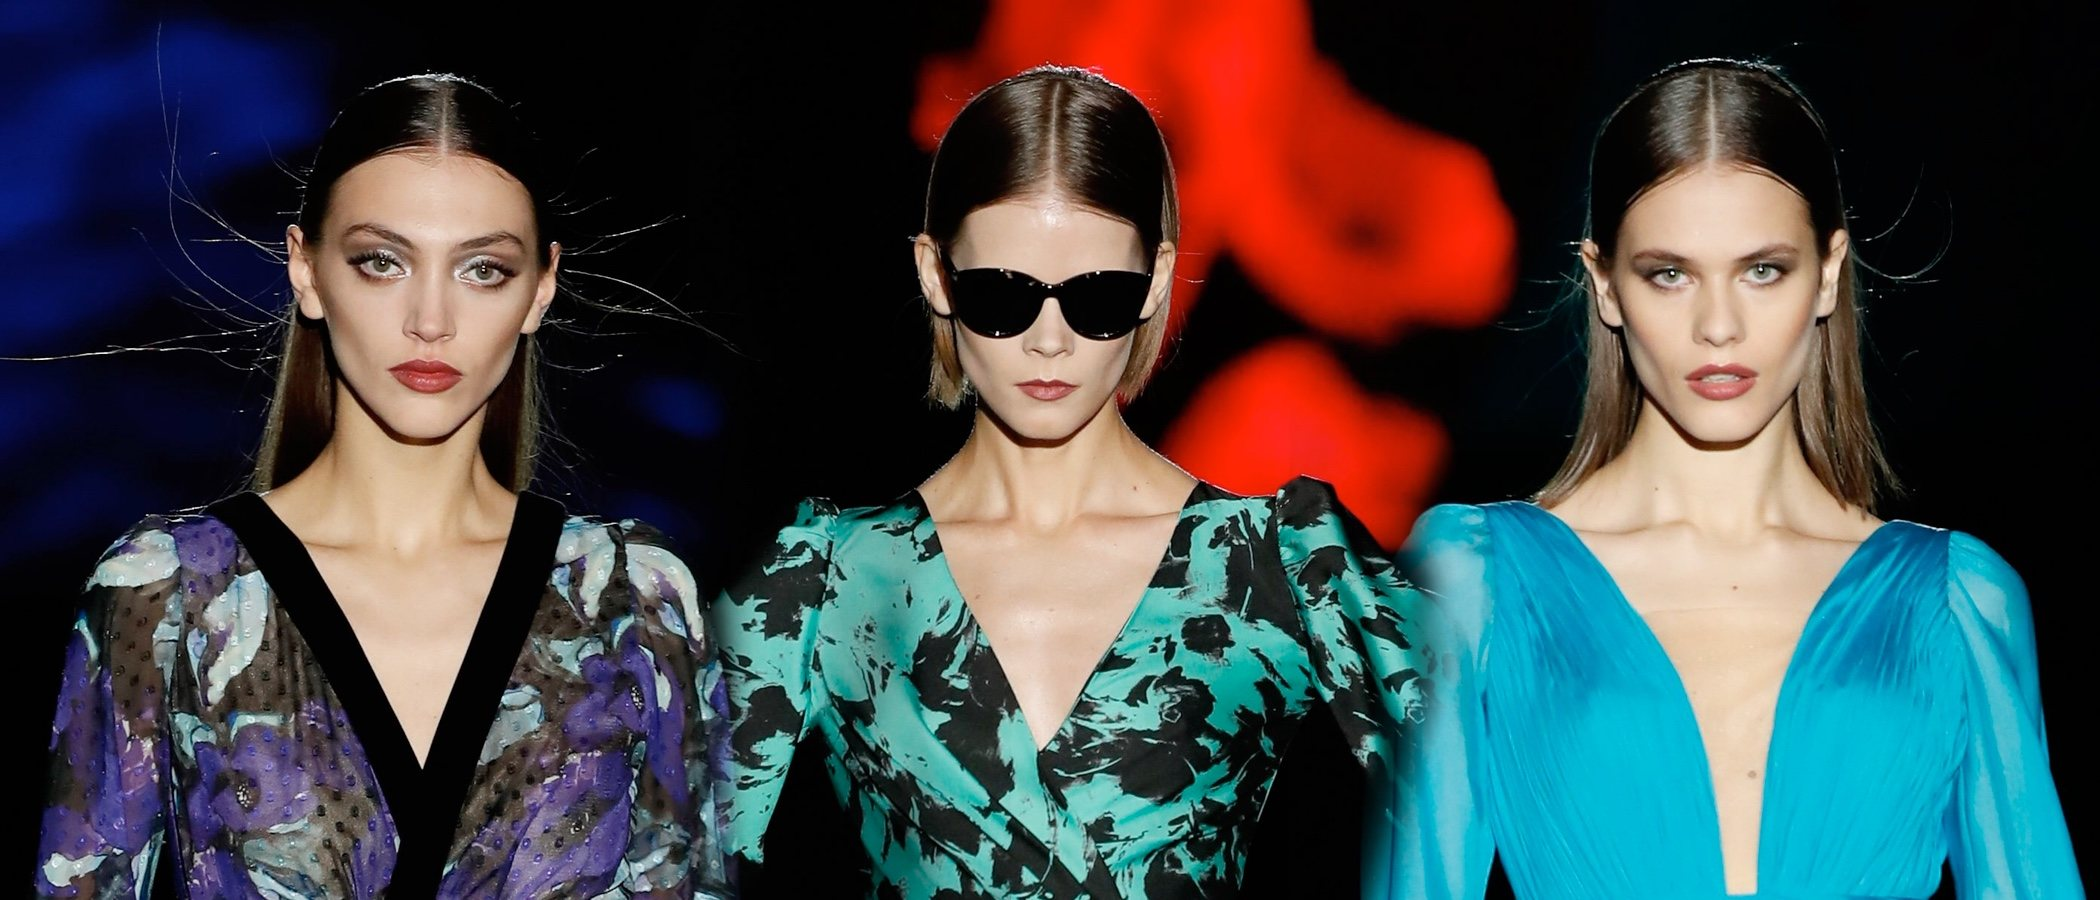 La 'Phantasize' de Hannibal Laguna para otoño/invierno 2020-2021 se desliza en Madrid Fashion Week